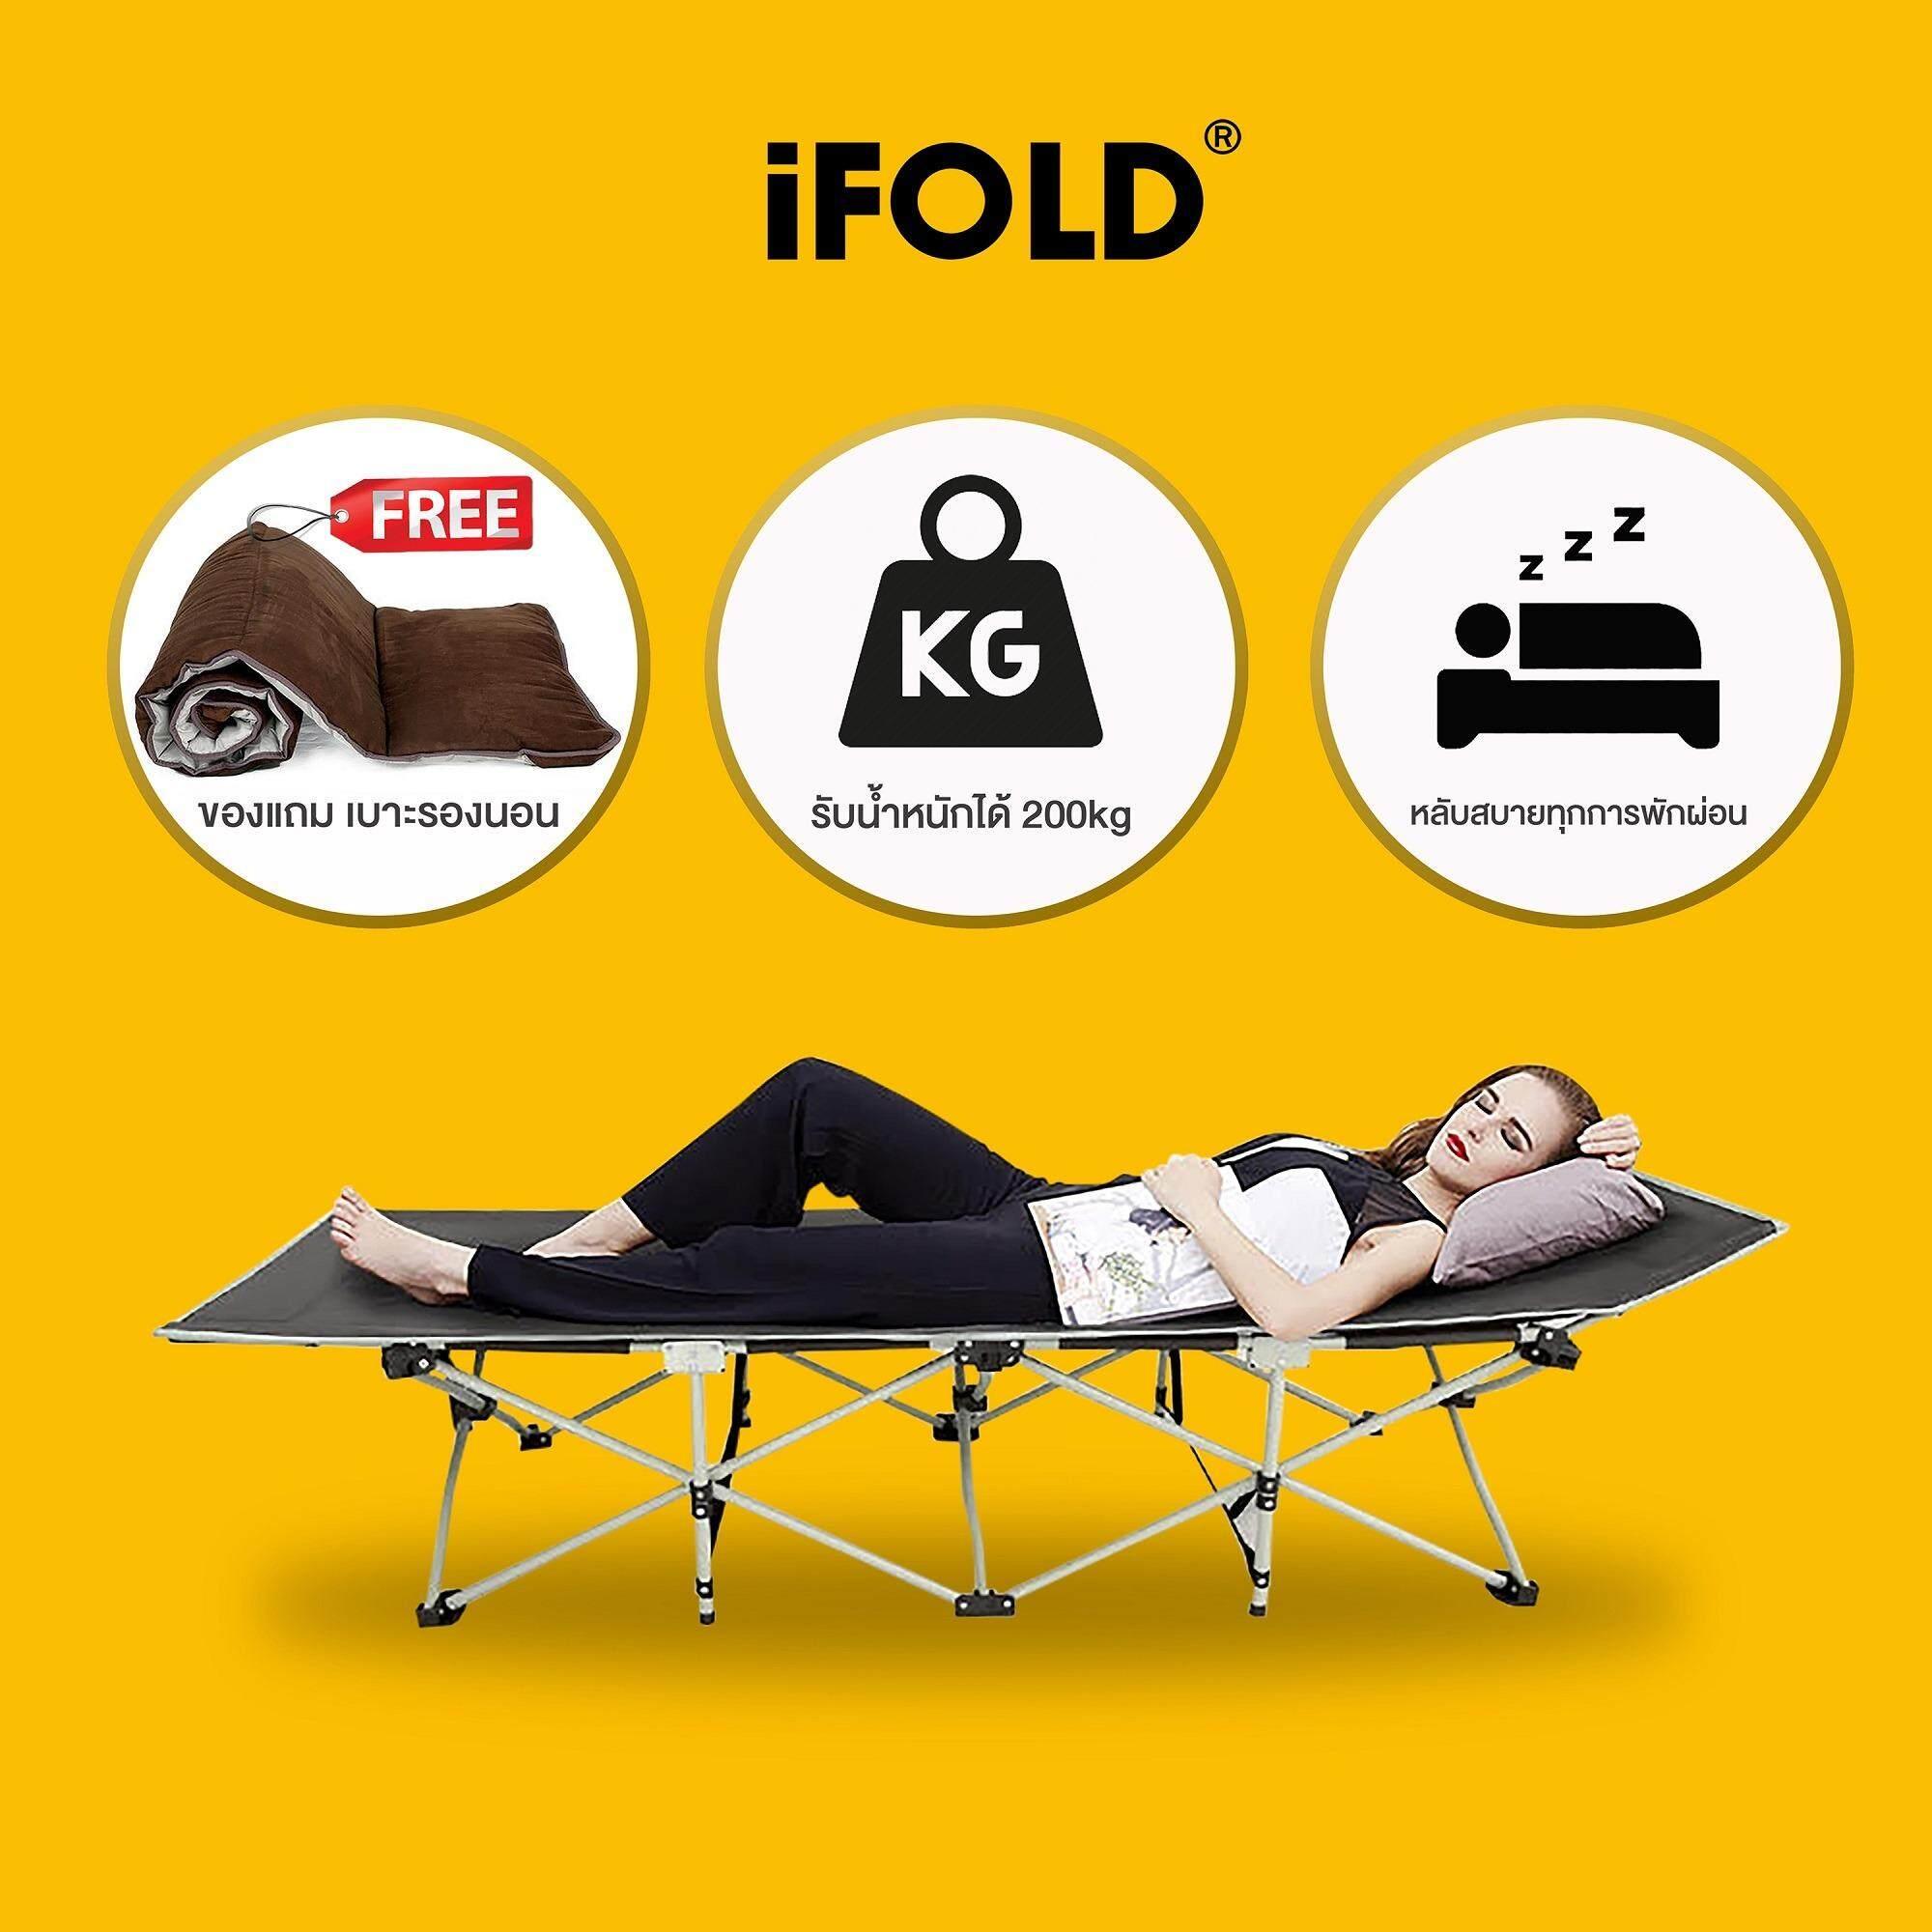 Sivili Ifold เตียงสนามแบบพับได้ สีเทา (ฟรี เบาะรองสีน้ำตาล) .